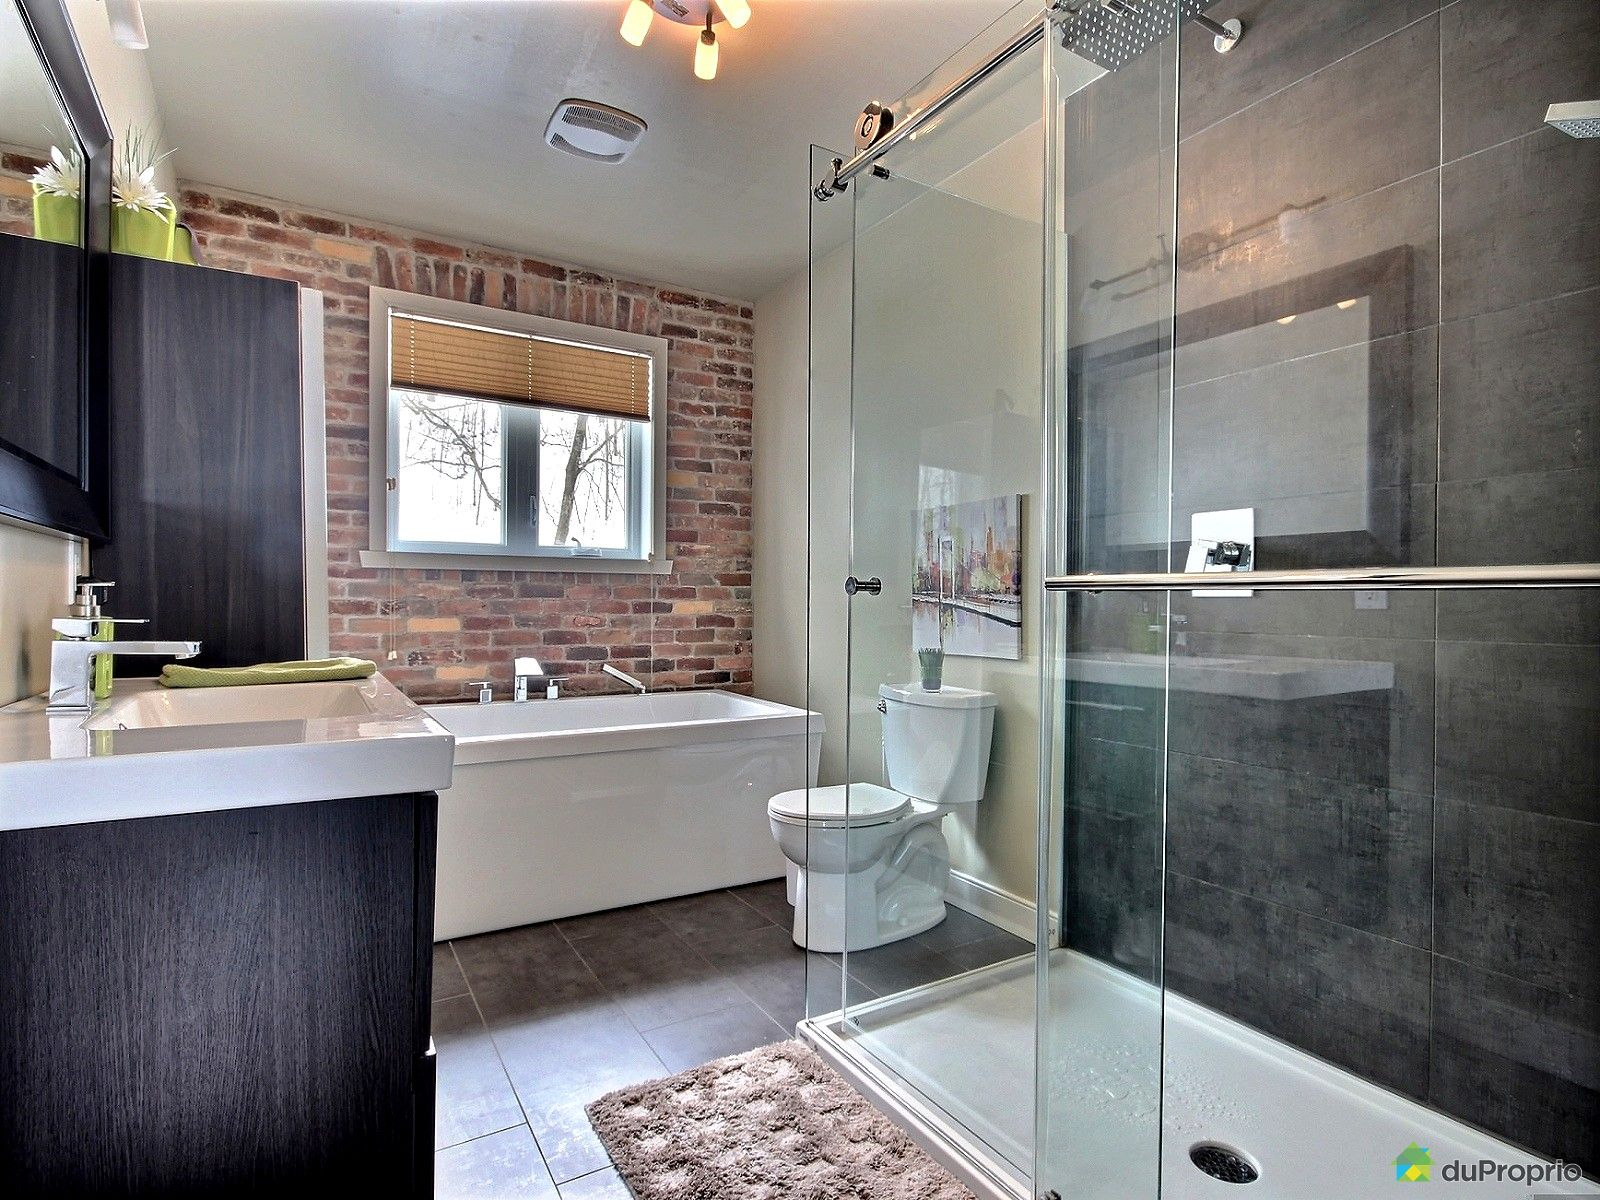 maison vendre ile d 39 orleans st jean 5018 chemin royal immobilier qu bec duproprio 495739. Black Bedroom Furniture Sets. Home Design Ideas